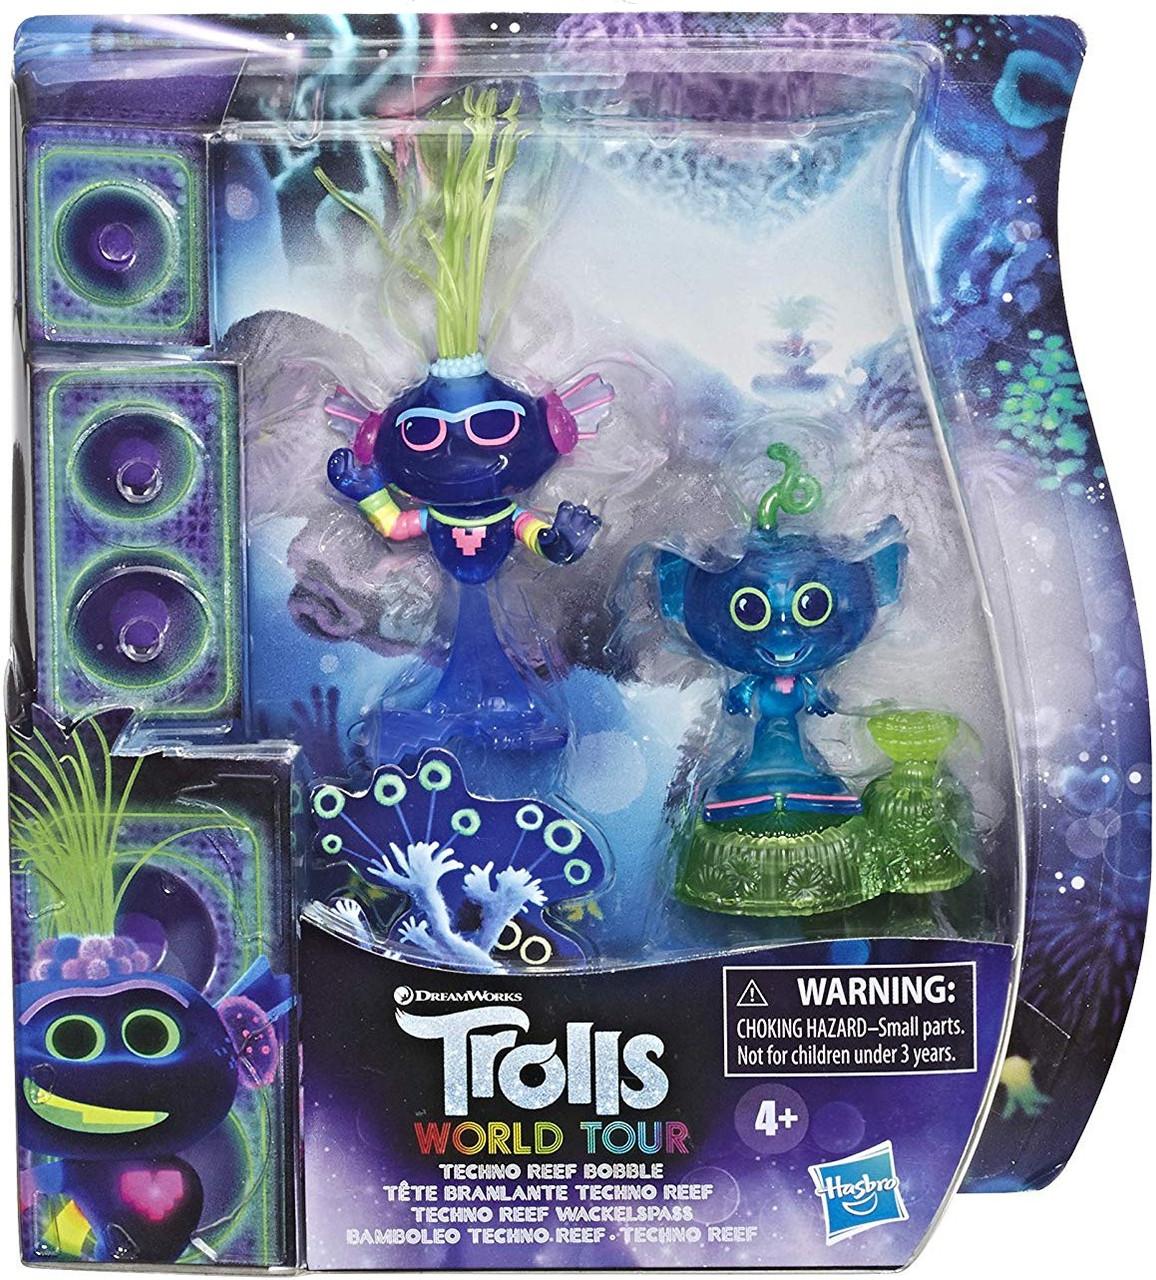 Trolls World Tour Techno Reef Bobble 2 Figure 2 Pack Hasbro Toys